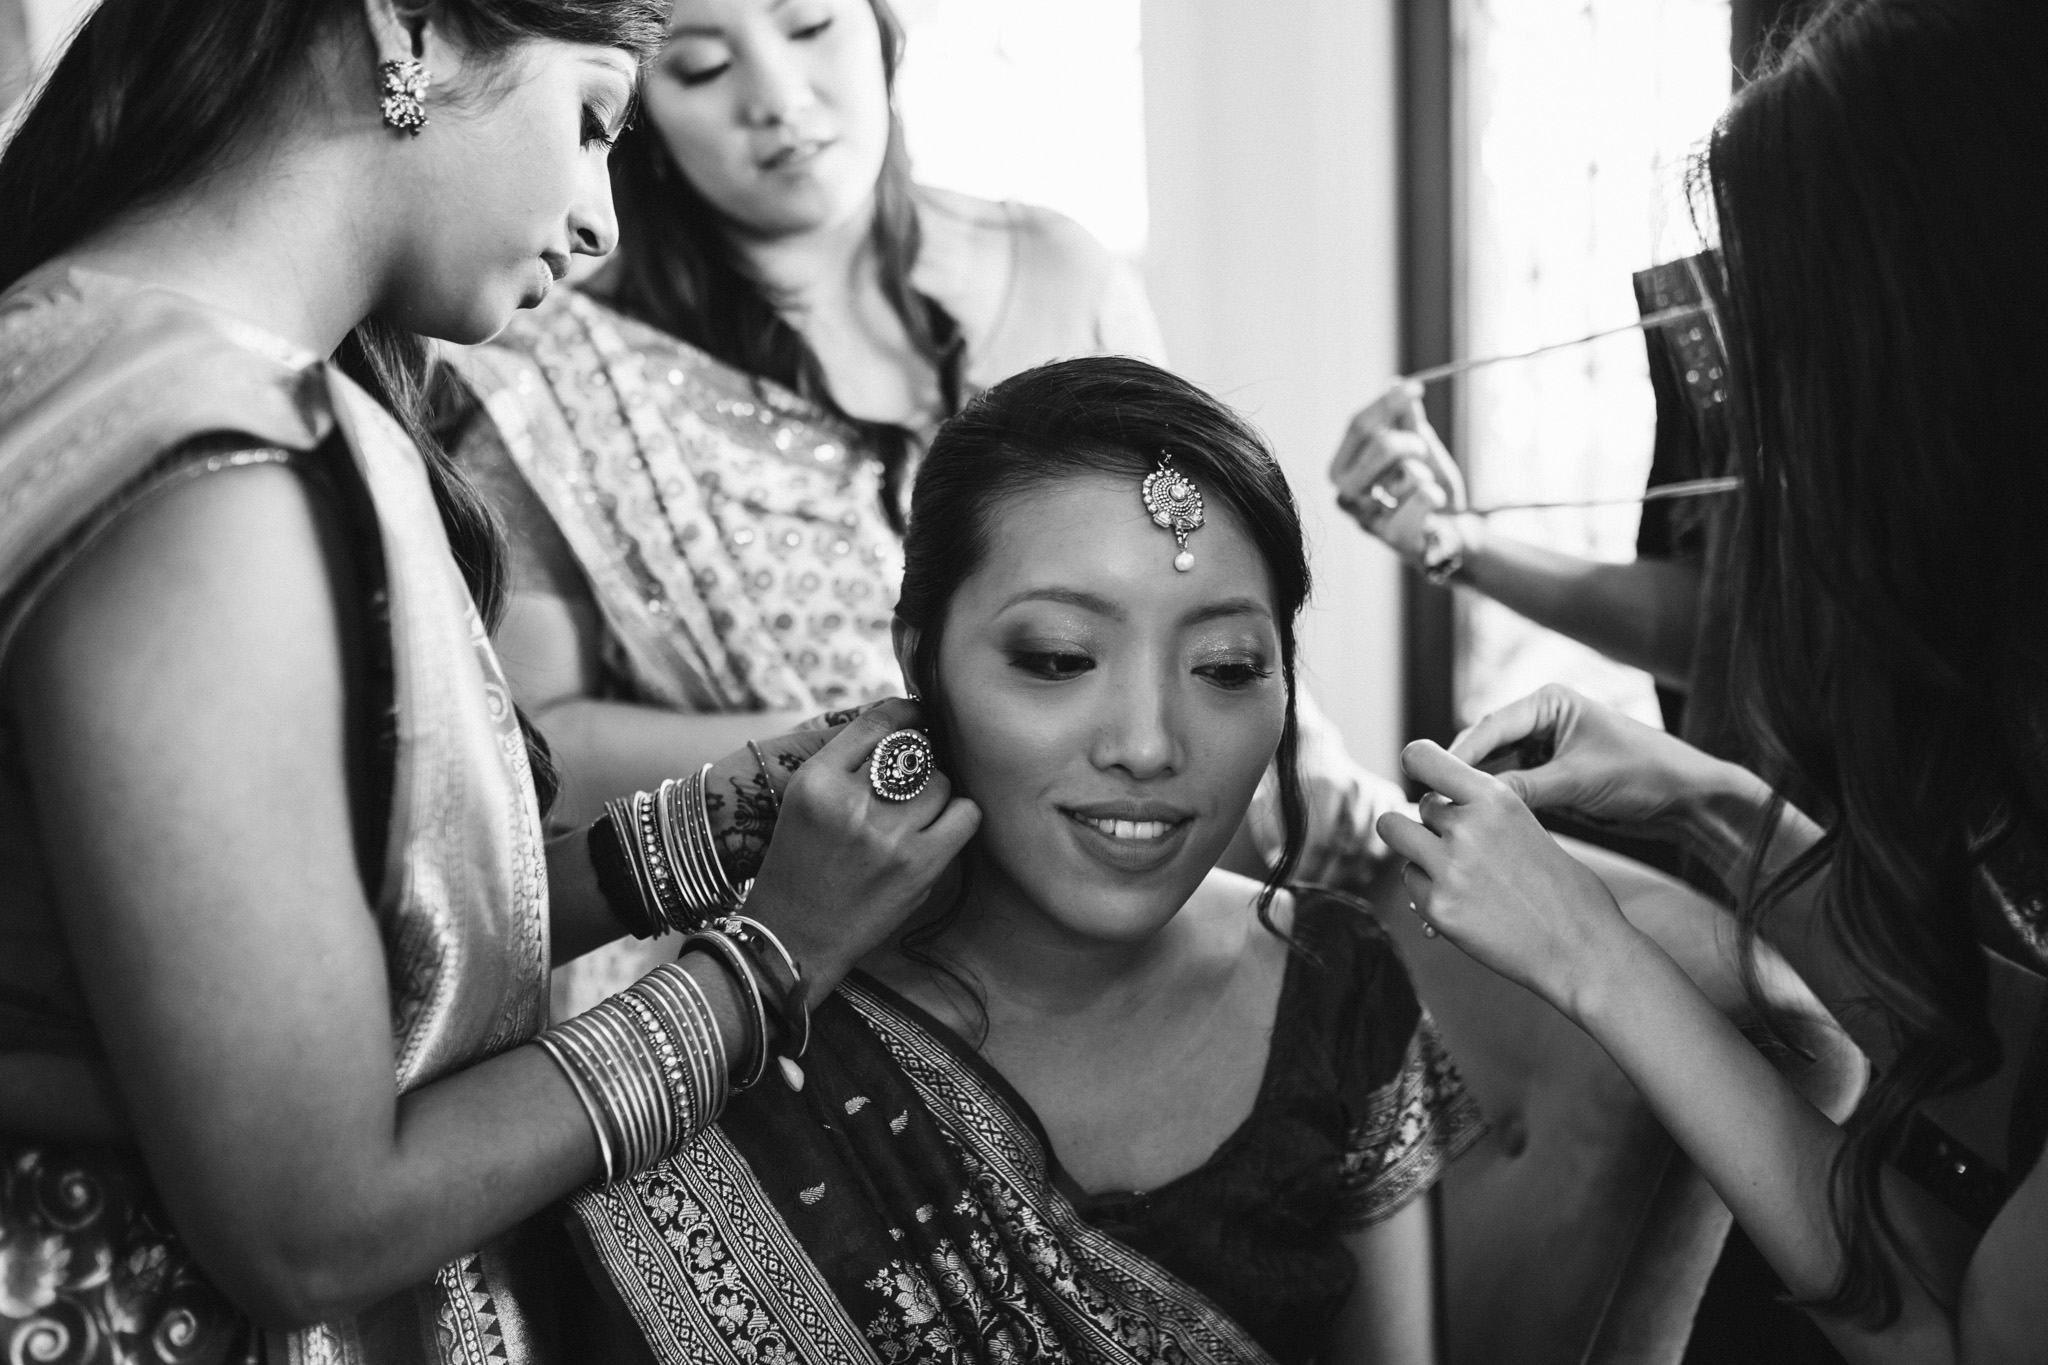 rebeccaburtphotography.hindiwedding.moraisvineyards.virginiawedding-26.JPG